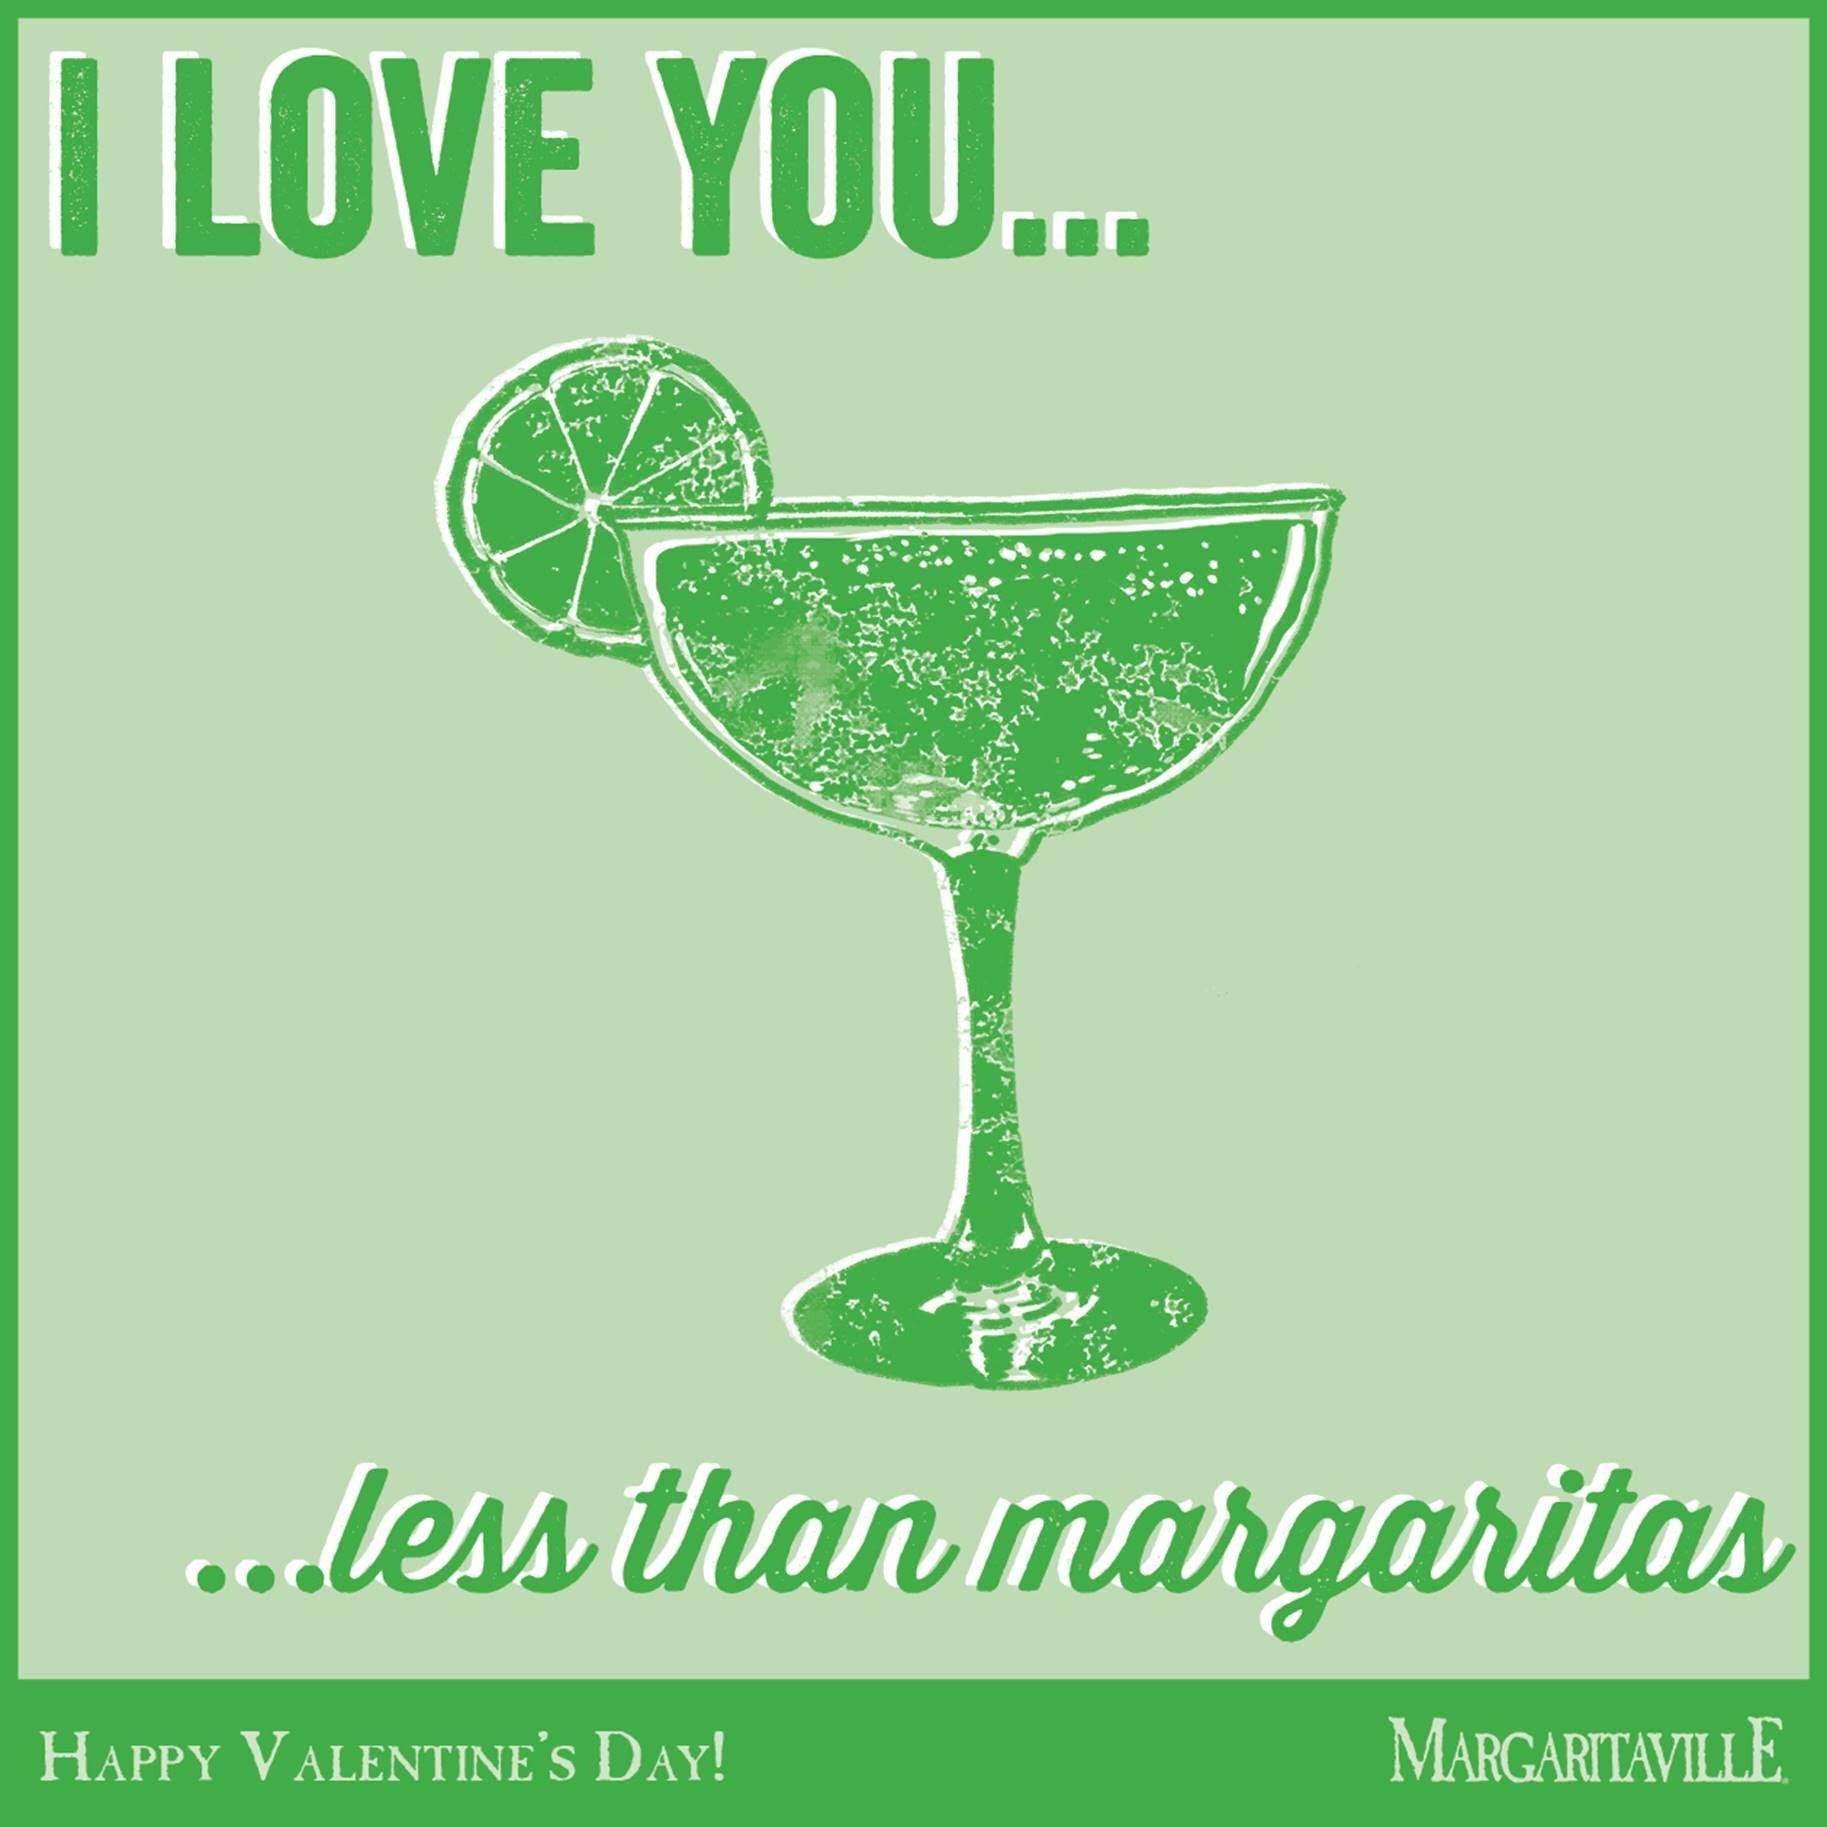 love-you-less-than-margaritas